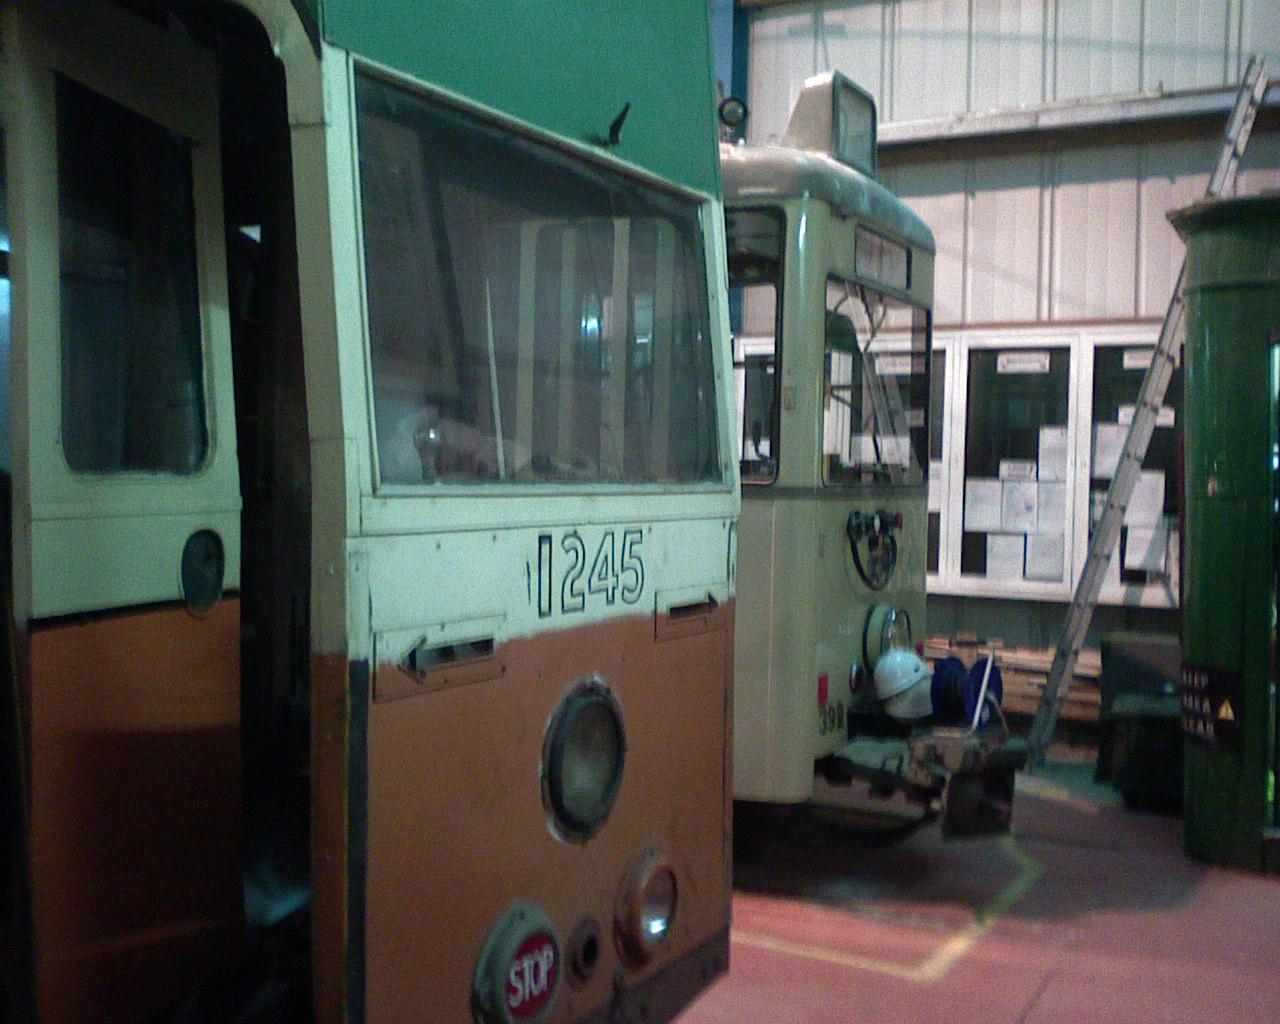 1245 awaits restoration at Summerlee